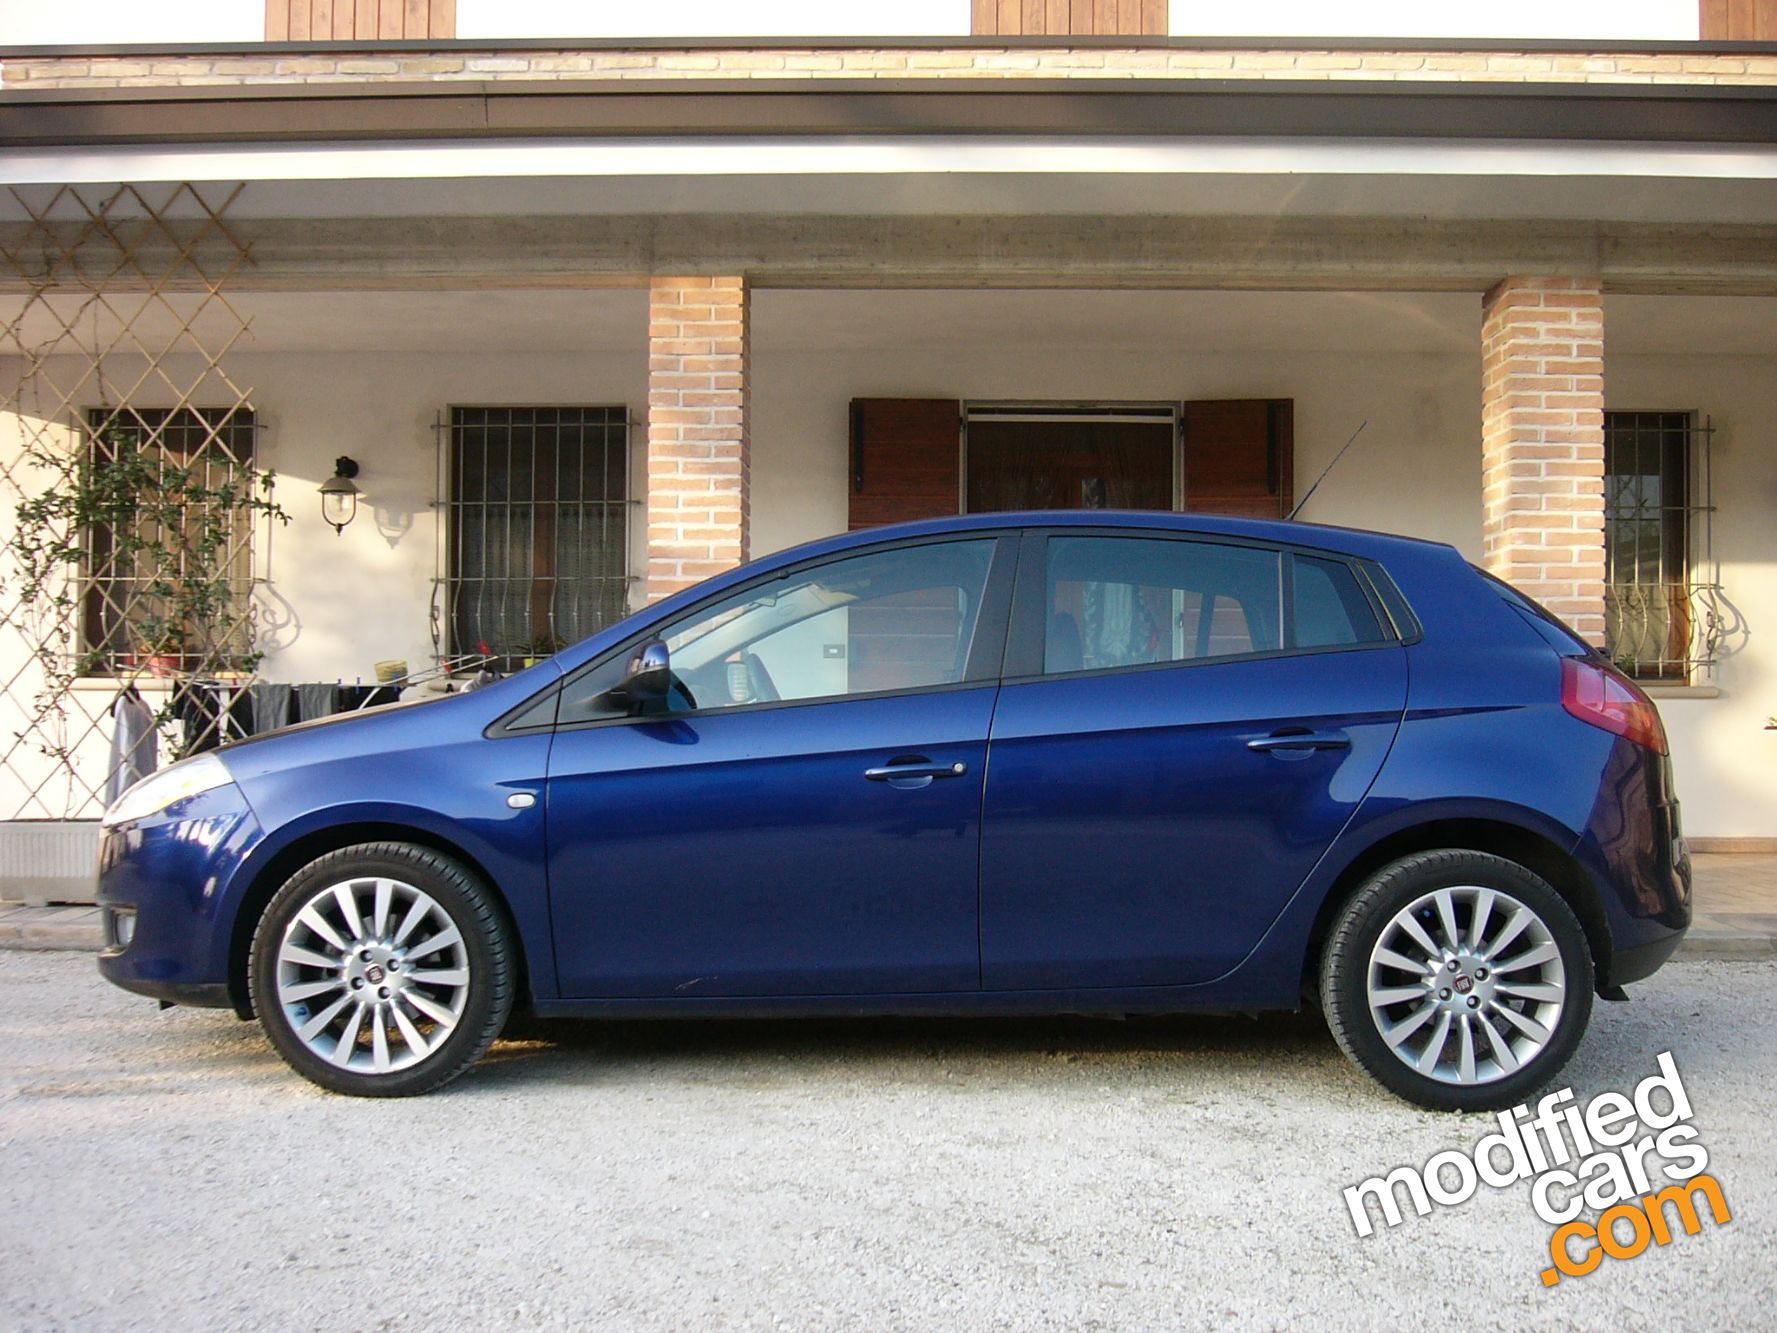 Fiat Bravo 1.9 Multijet Dynamic